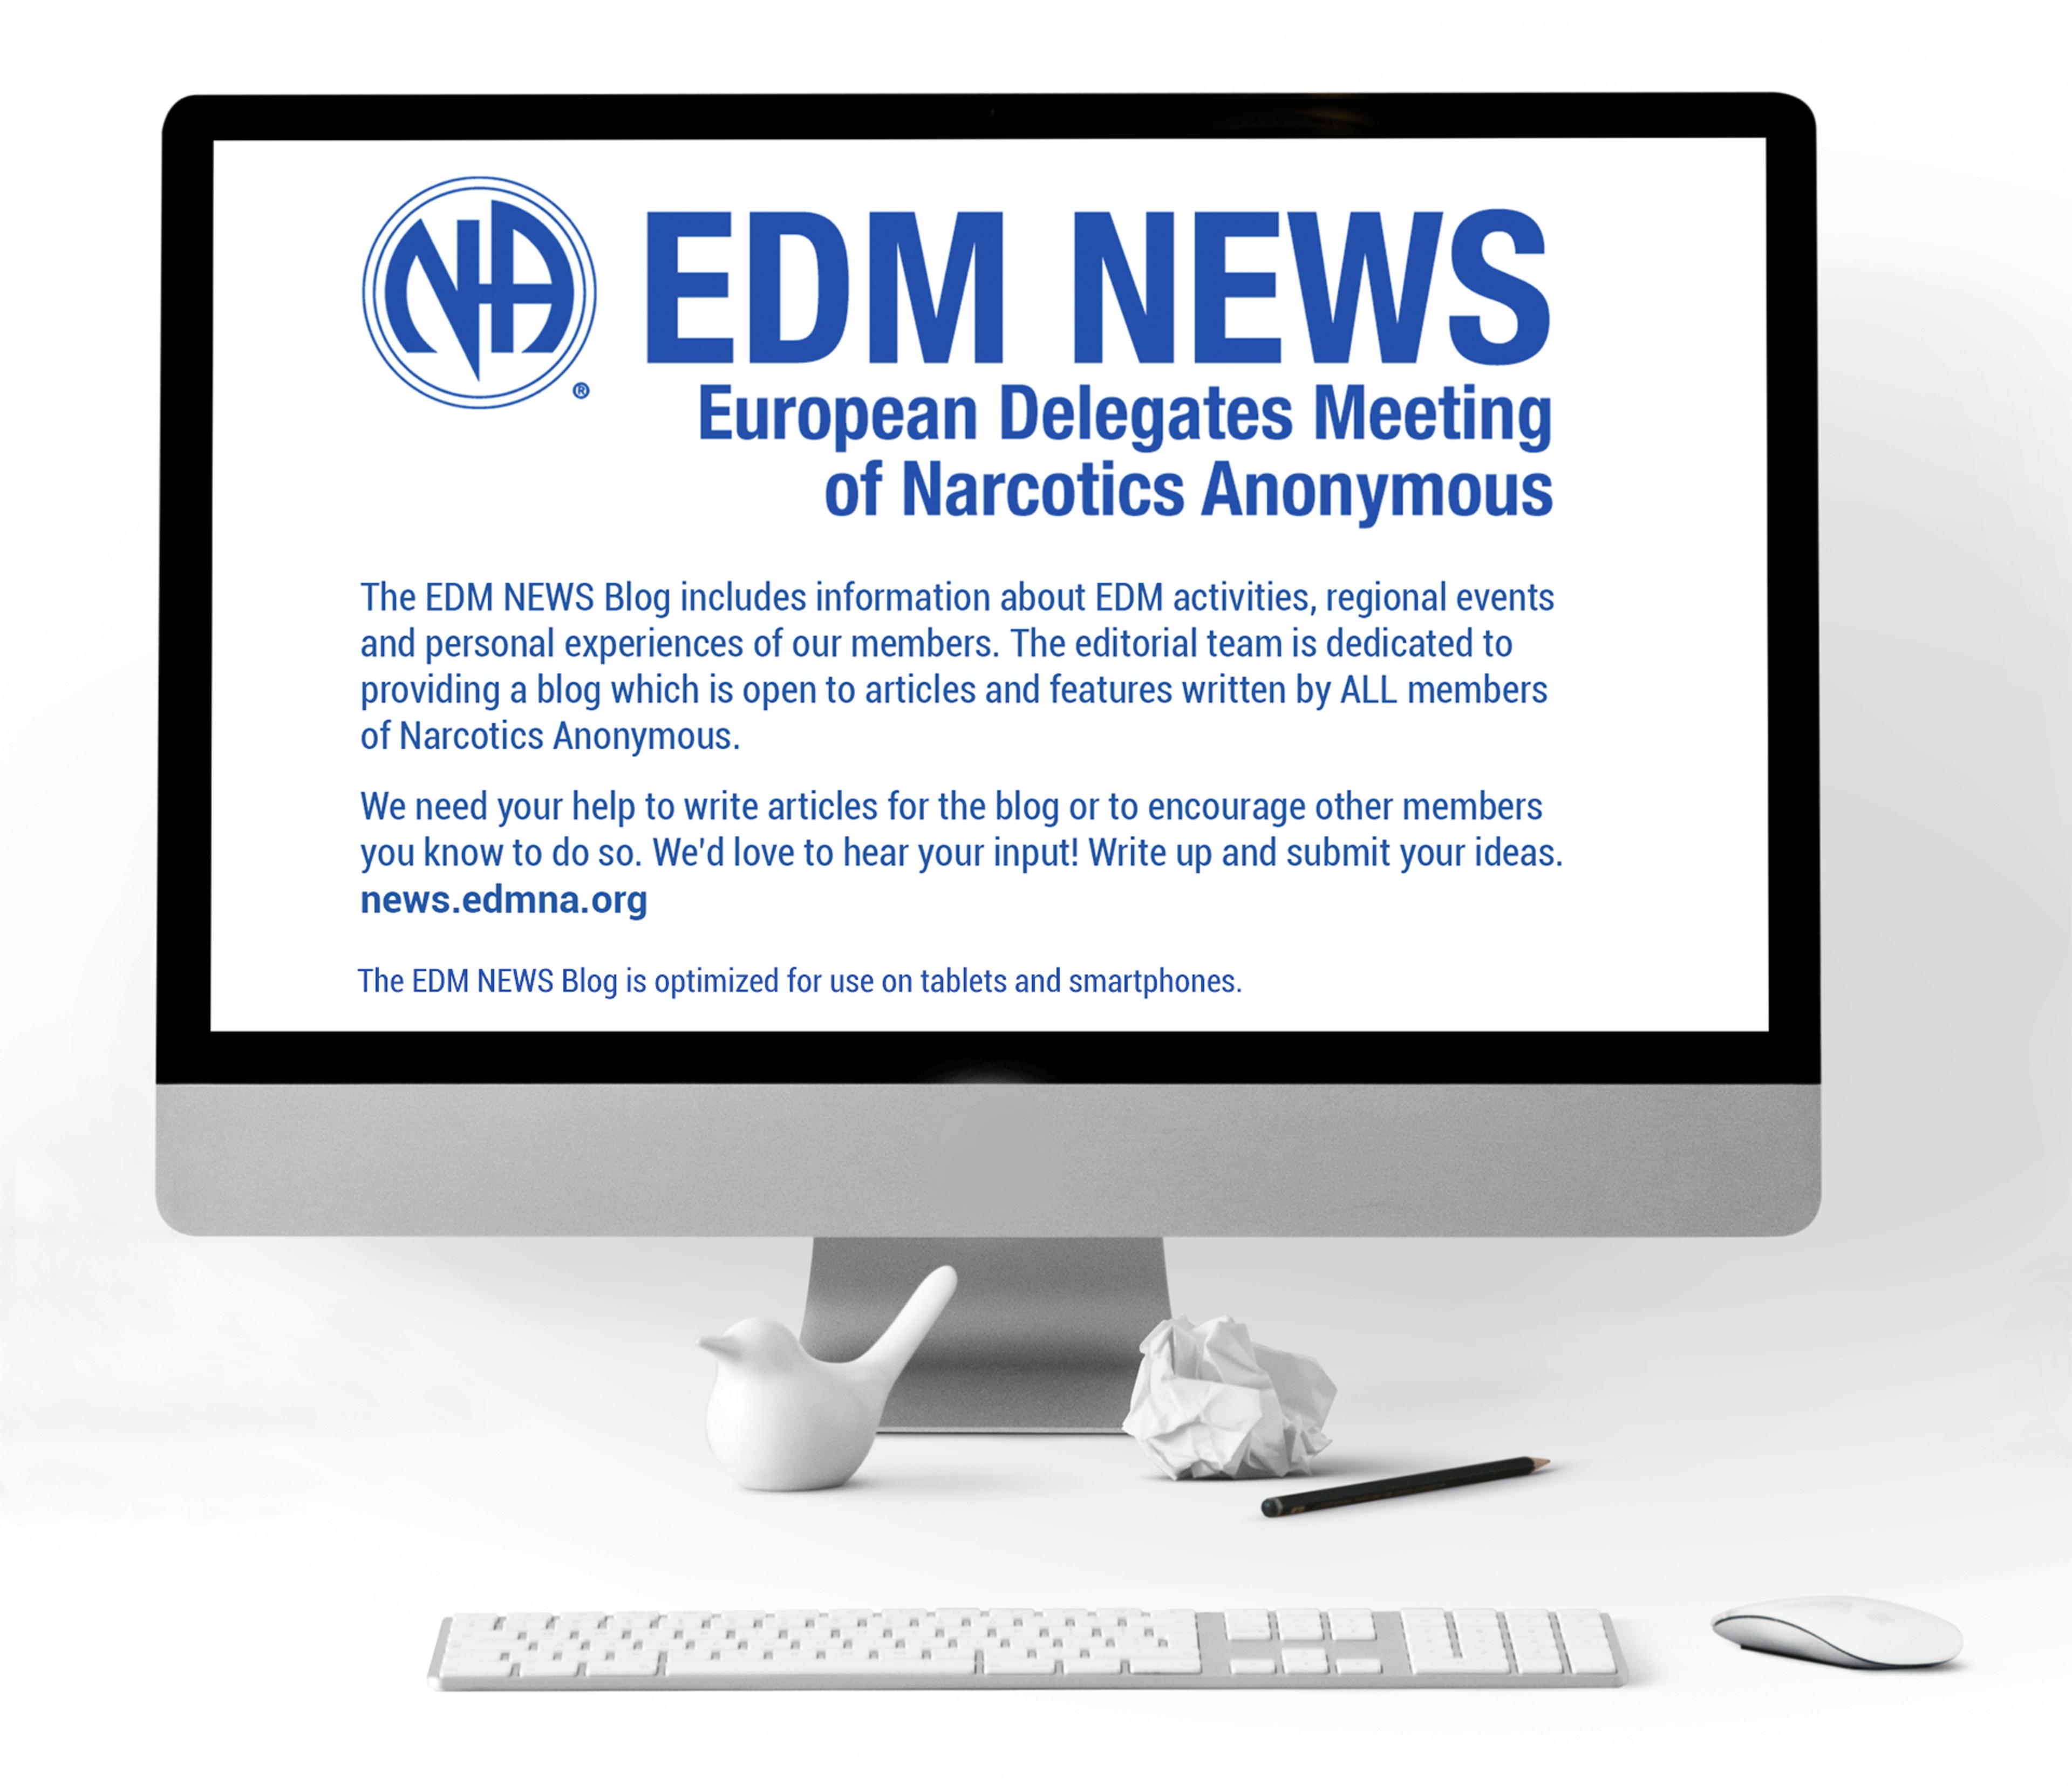 EDM-NEWS